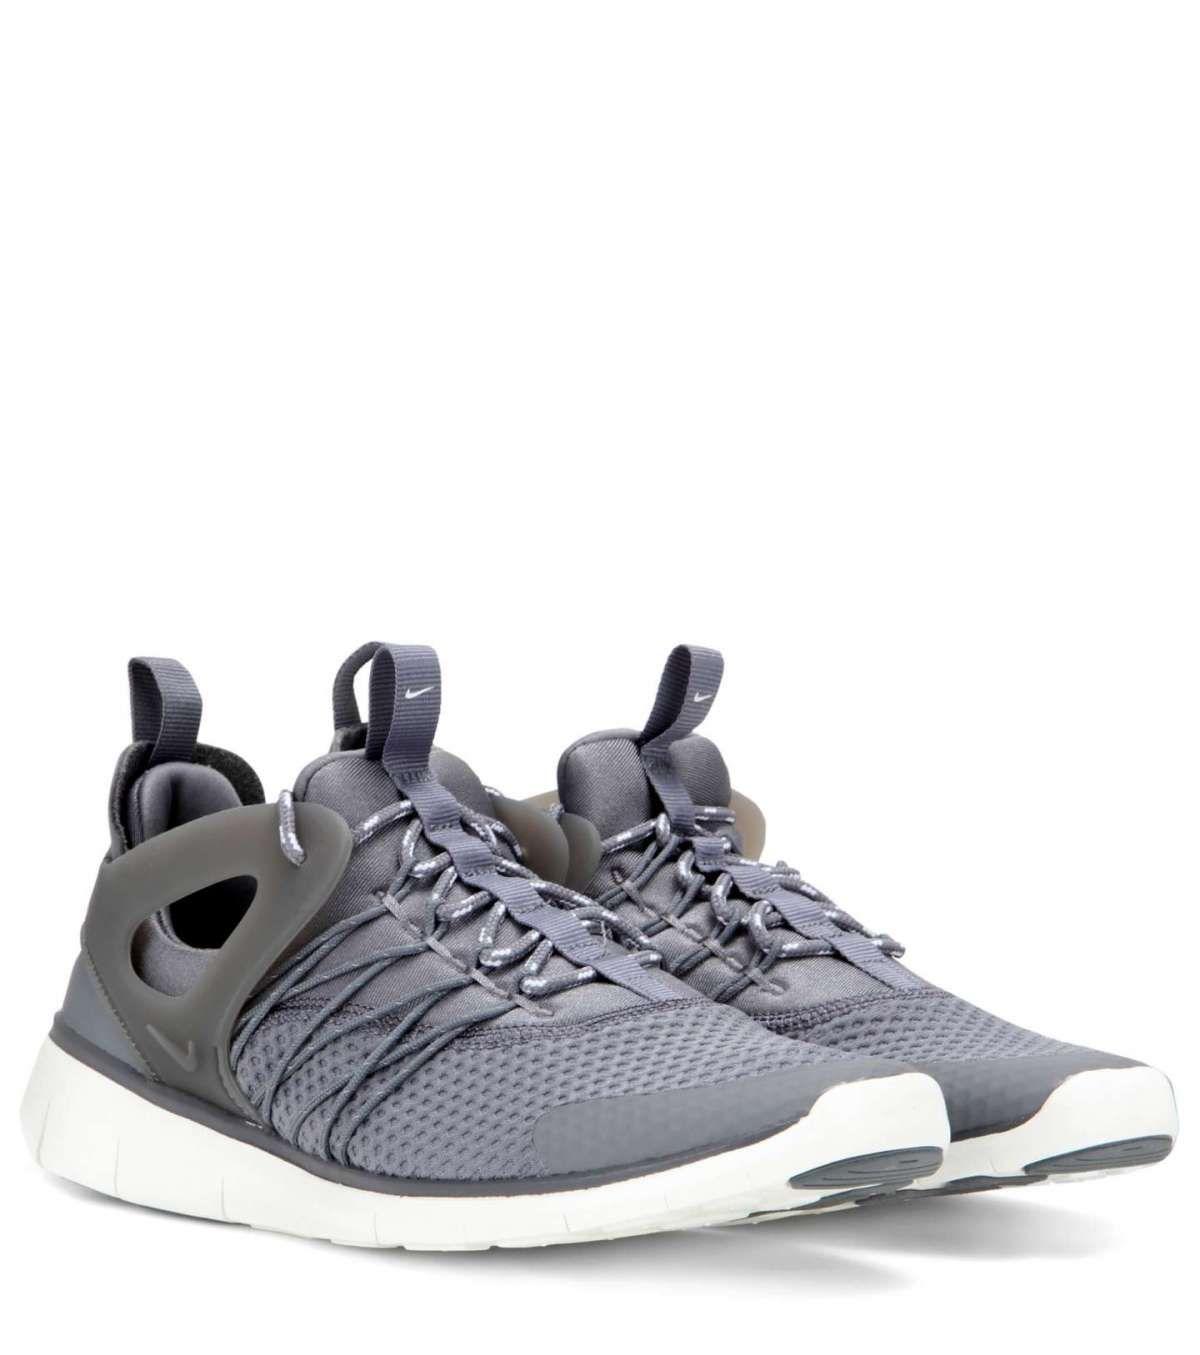 modelli scarpe nike 2016